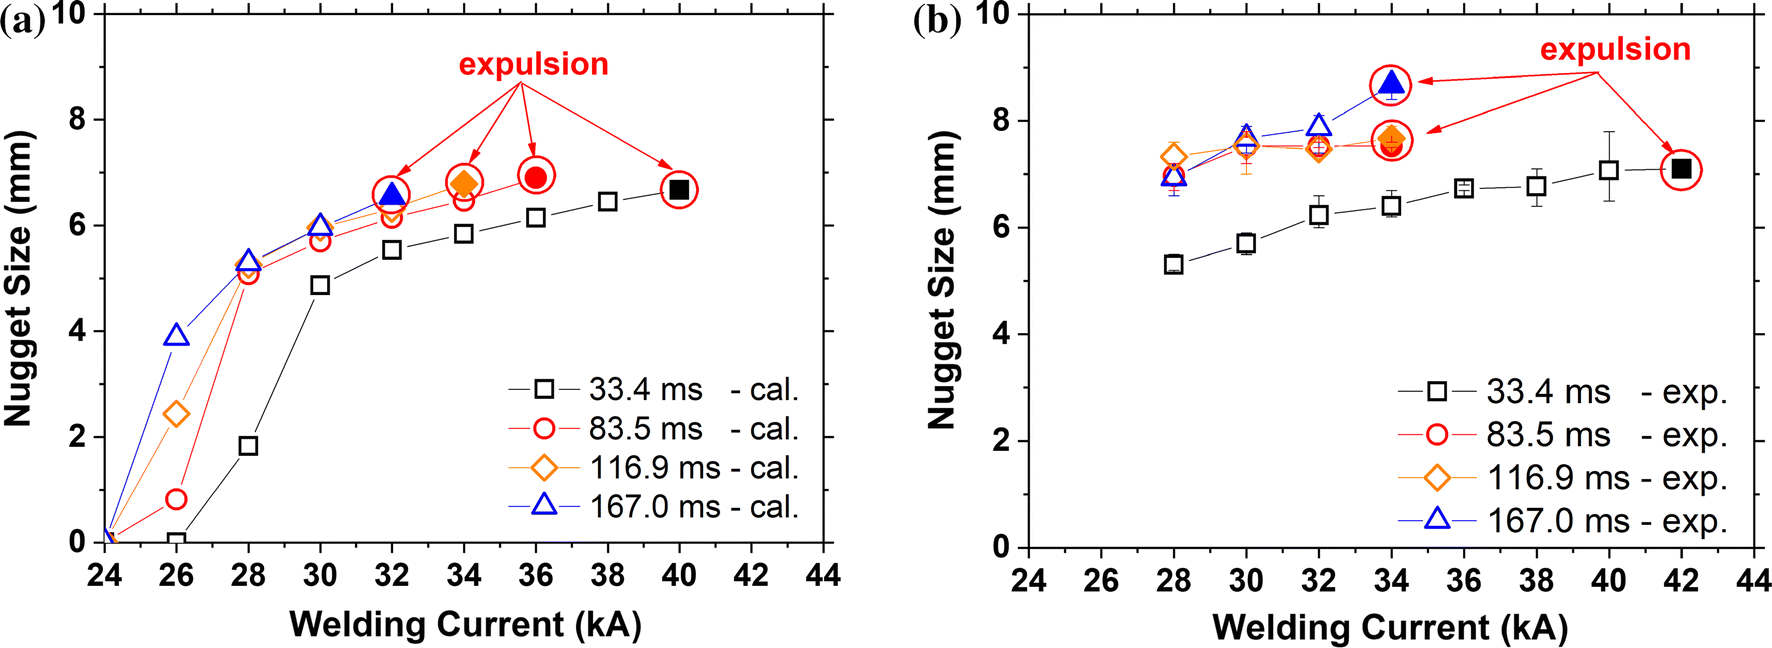 Effect Of Welding Time On Resistance Spot Weldability Aluminum Lobe Diagram Open Image In New Window